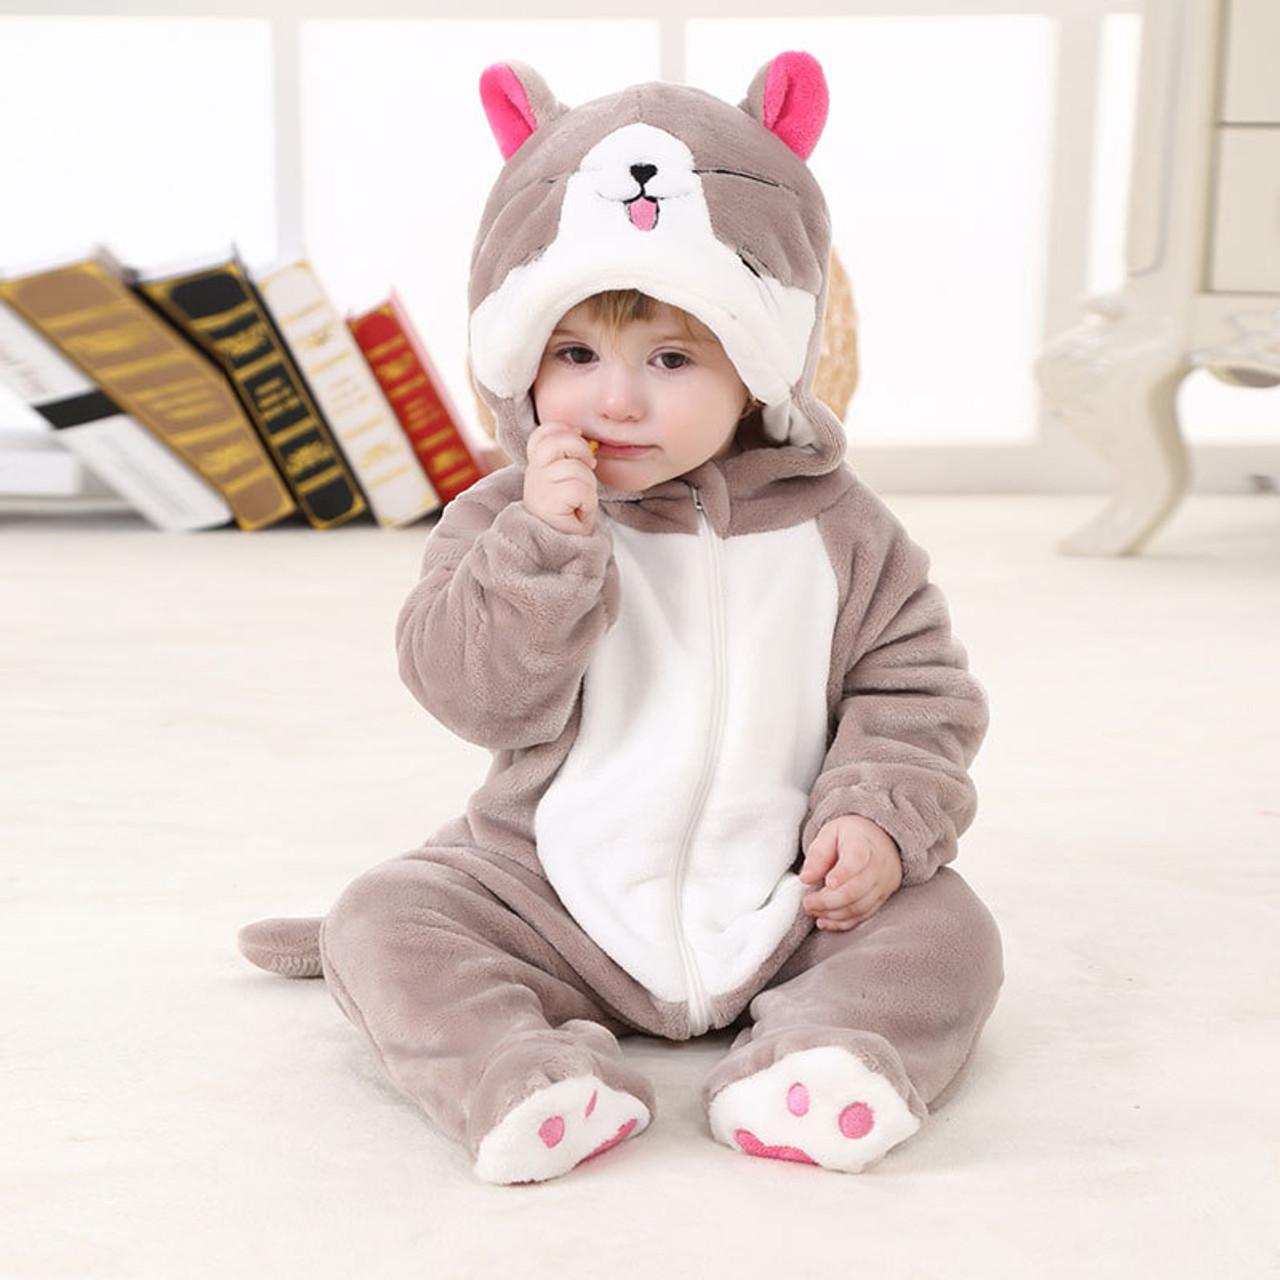 61b03704e ... Hooded Baby Romper Infant Jumpsuit Toddler Onesie for 0-3 Years Baby  Boys Girls Pikachu ...